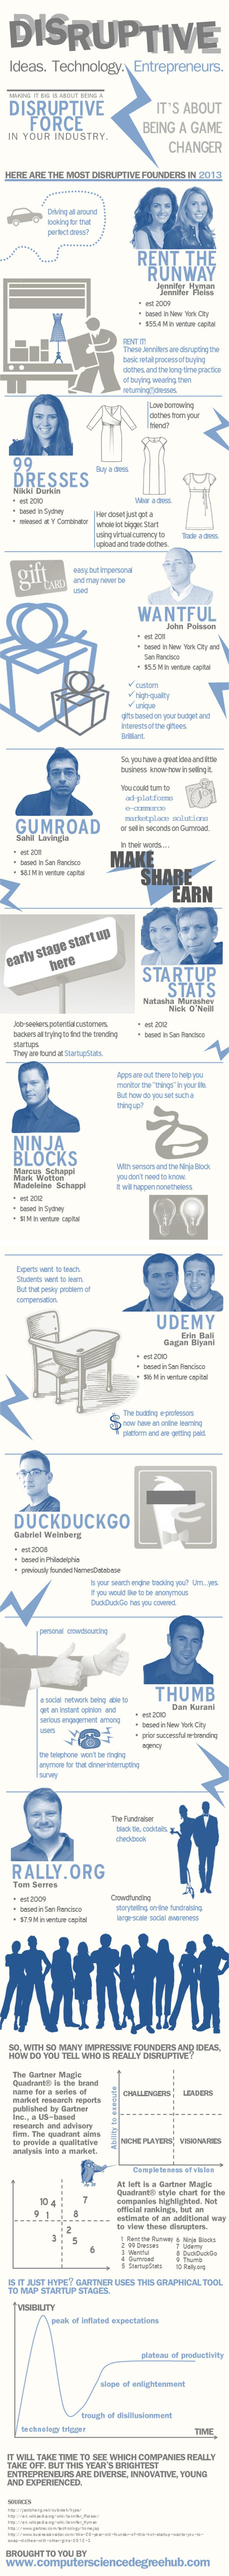 Disruptive Entrepreneurs